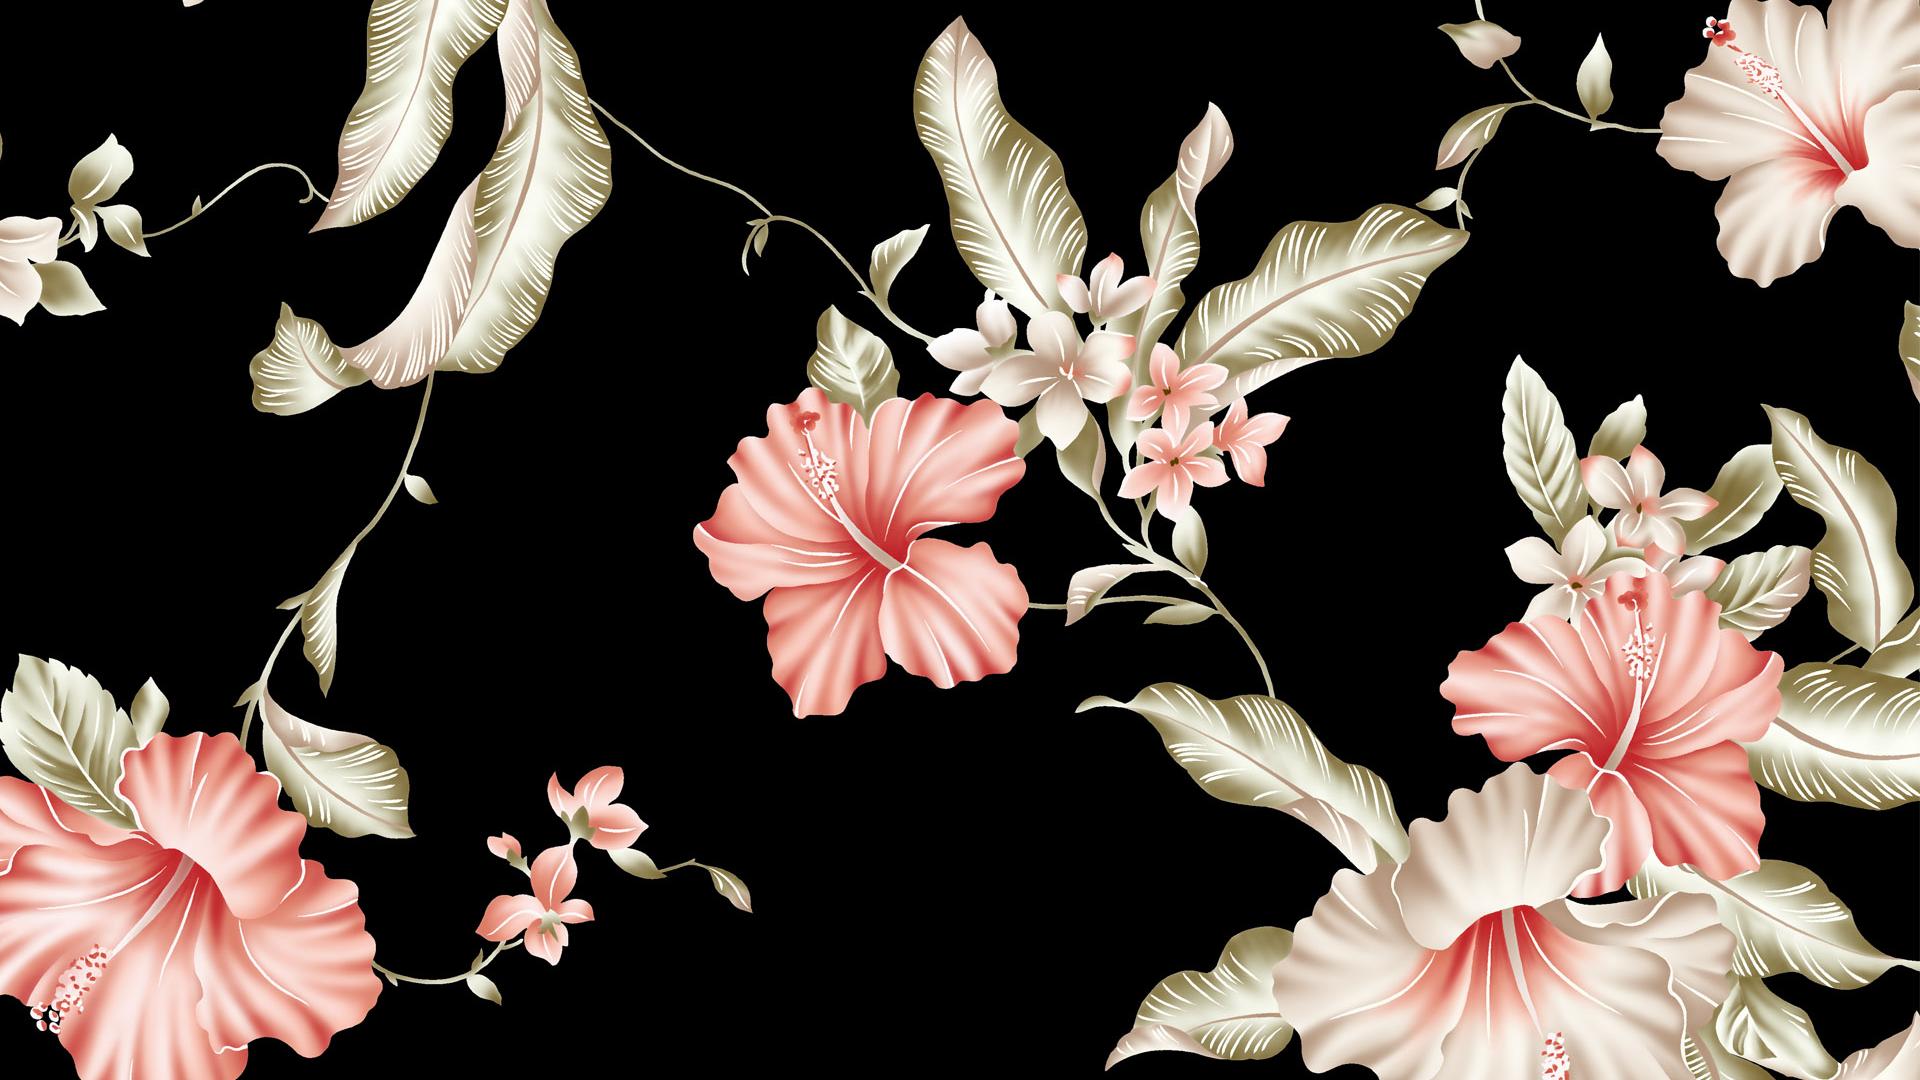 Free Download Iphone Uk Pinterest Photos Cheap Floral Wallpaper